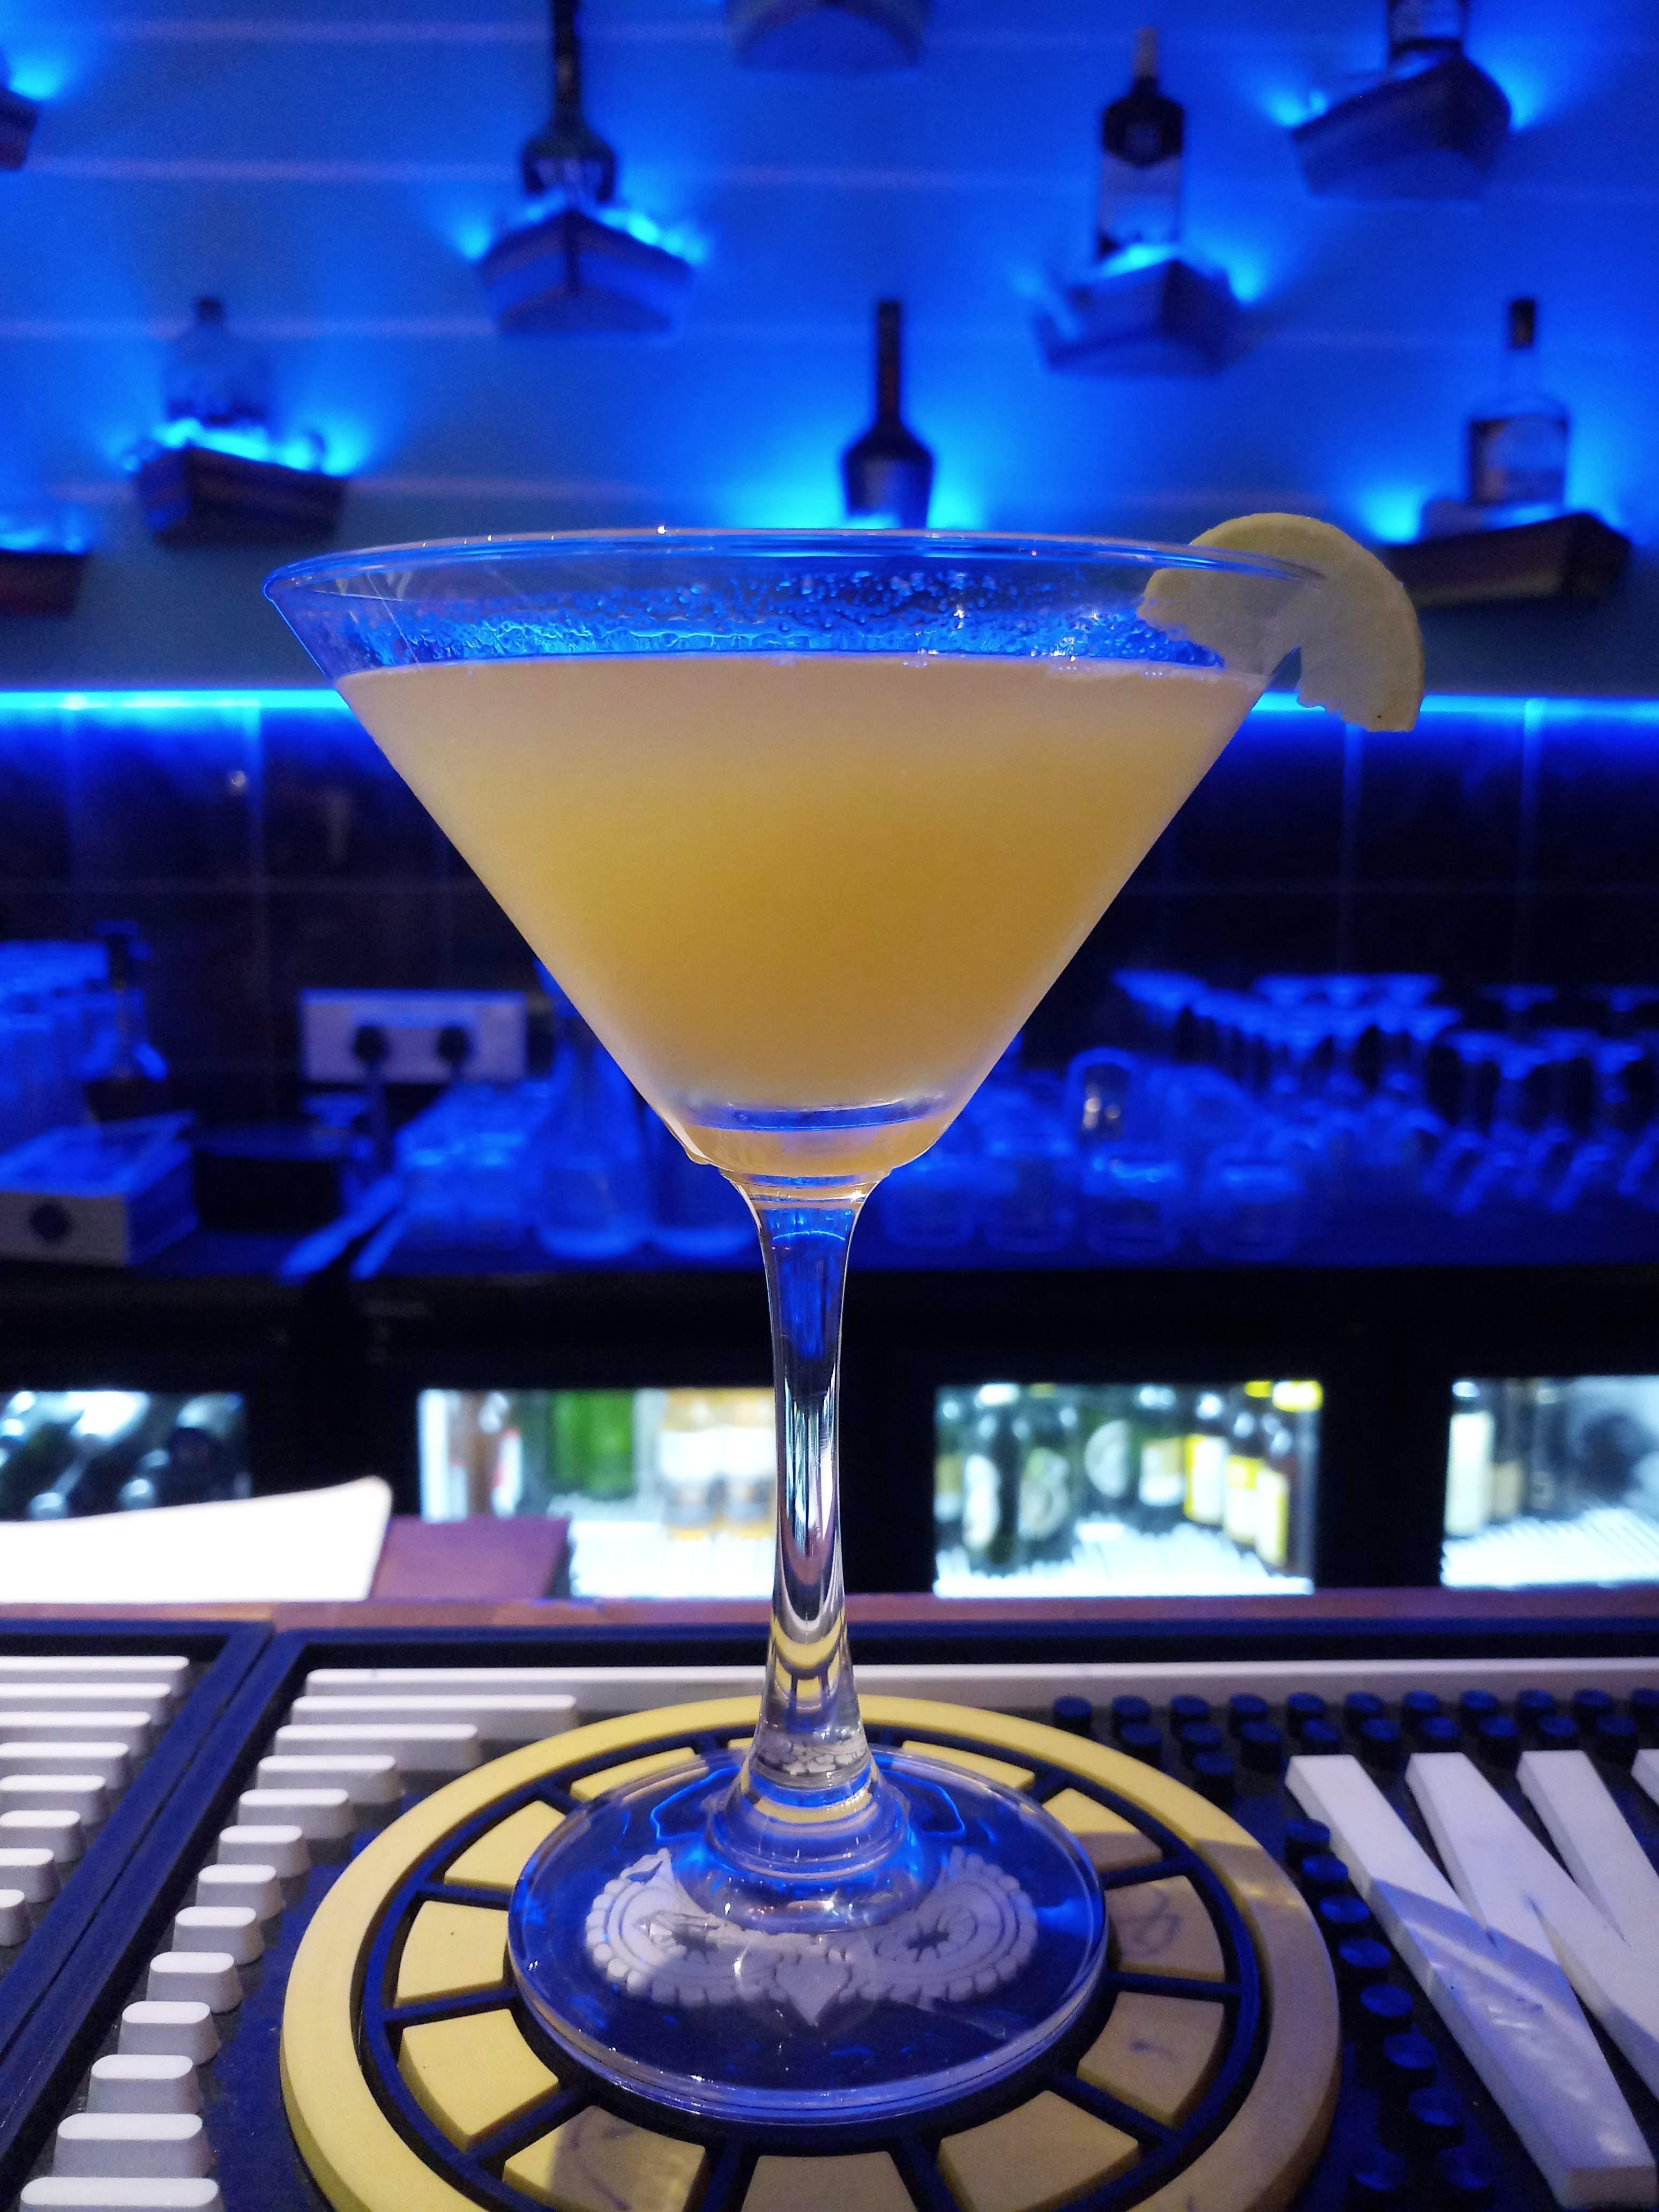 Drink,Alcoholic beverage,Martini glass,Classic cocktail,Distilled beverage,Liqueur,Daiquiri,Cobalt blue,Cocktail,Bacardi cocktail